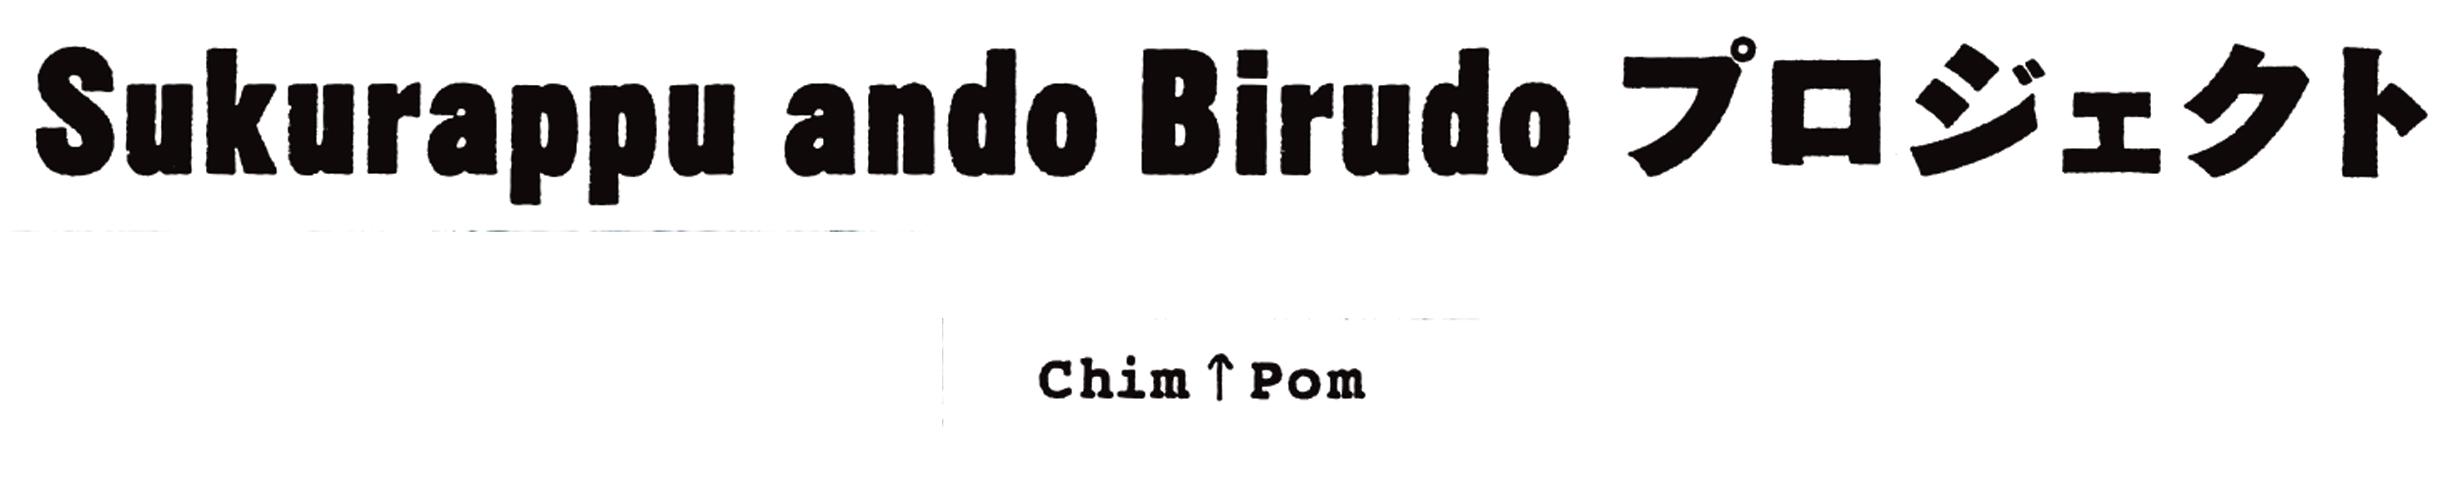 Sukurappu ando Birudo Project